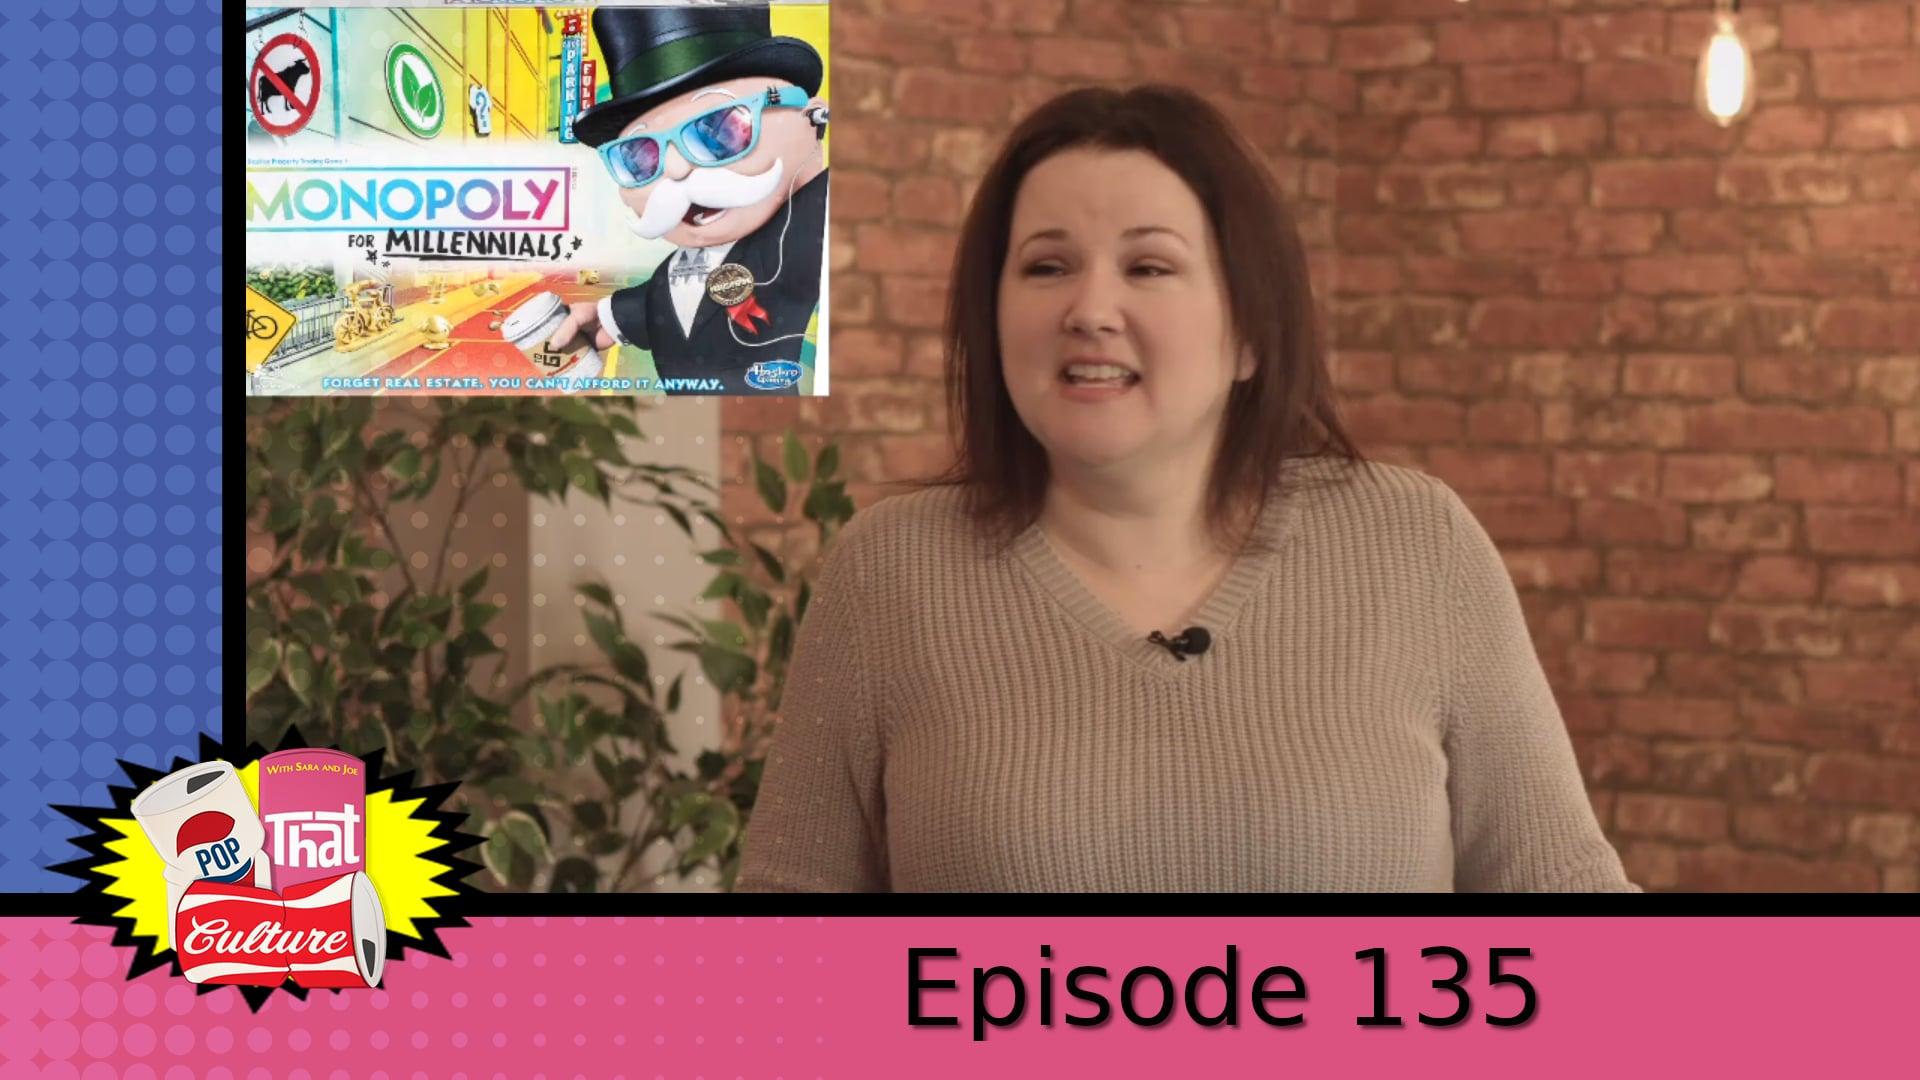 Pop That Culture - Episode 135